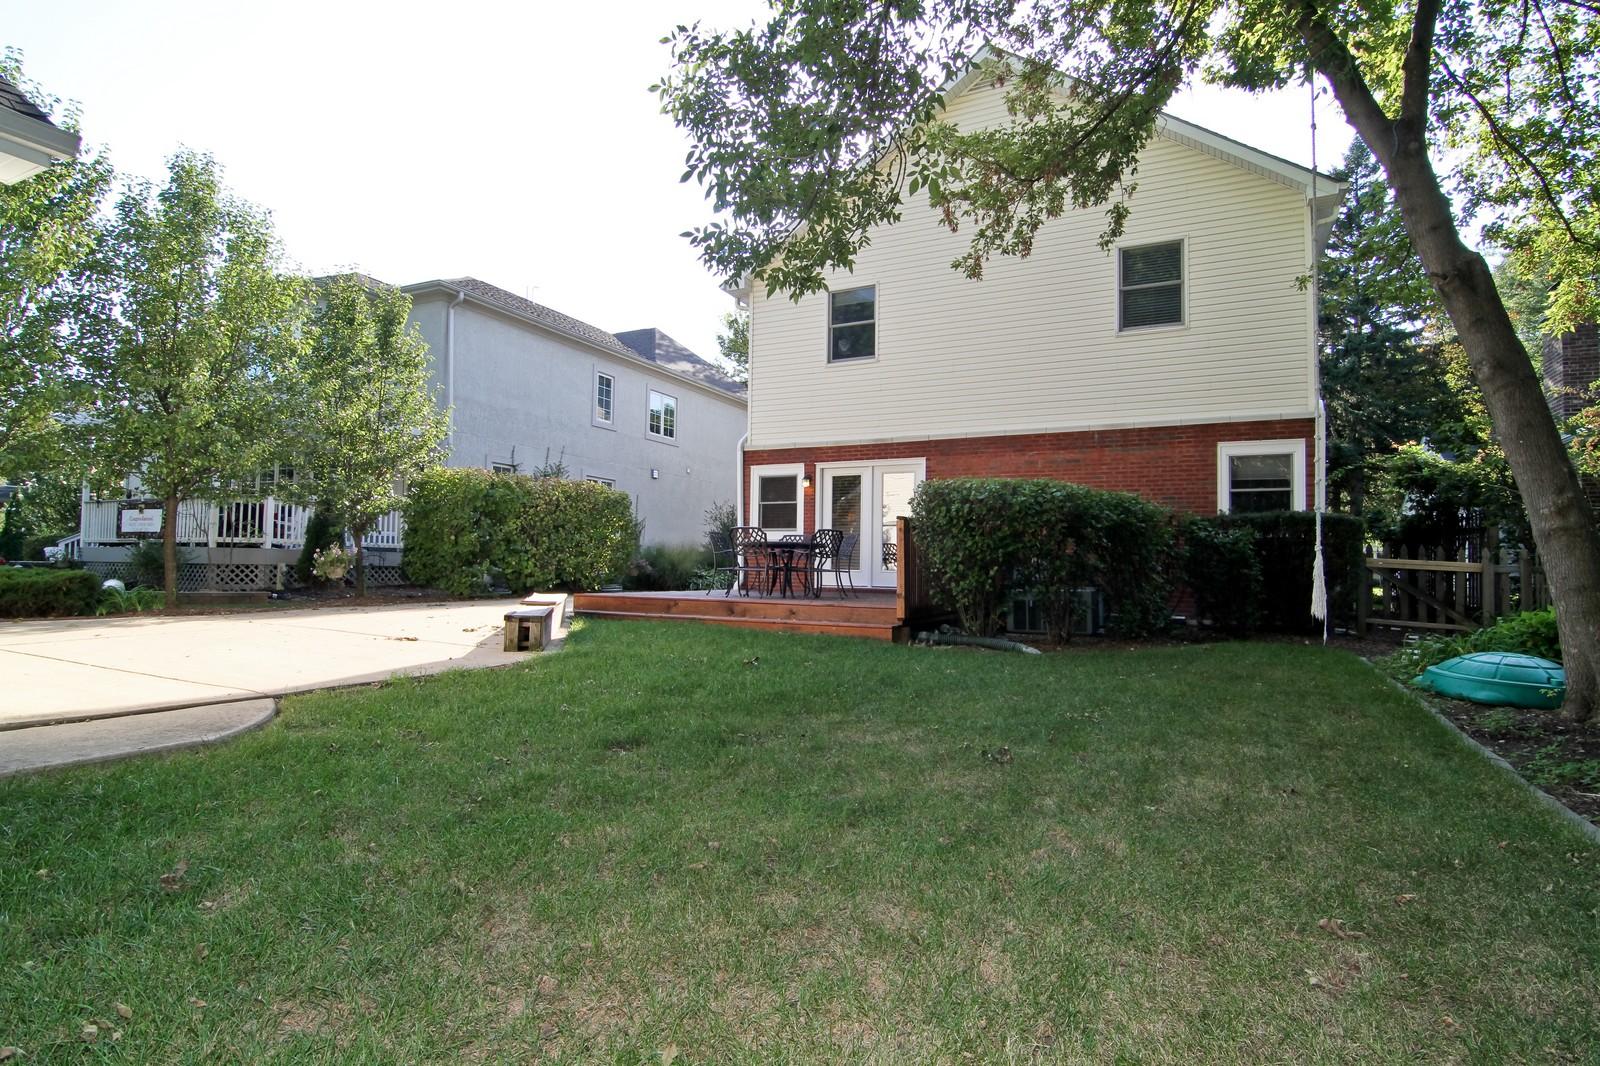 Real Estate Photography - 441 Edgewood Dr, La Grange, IL, 60525 - Rear View